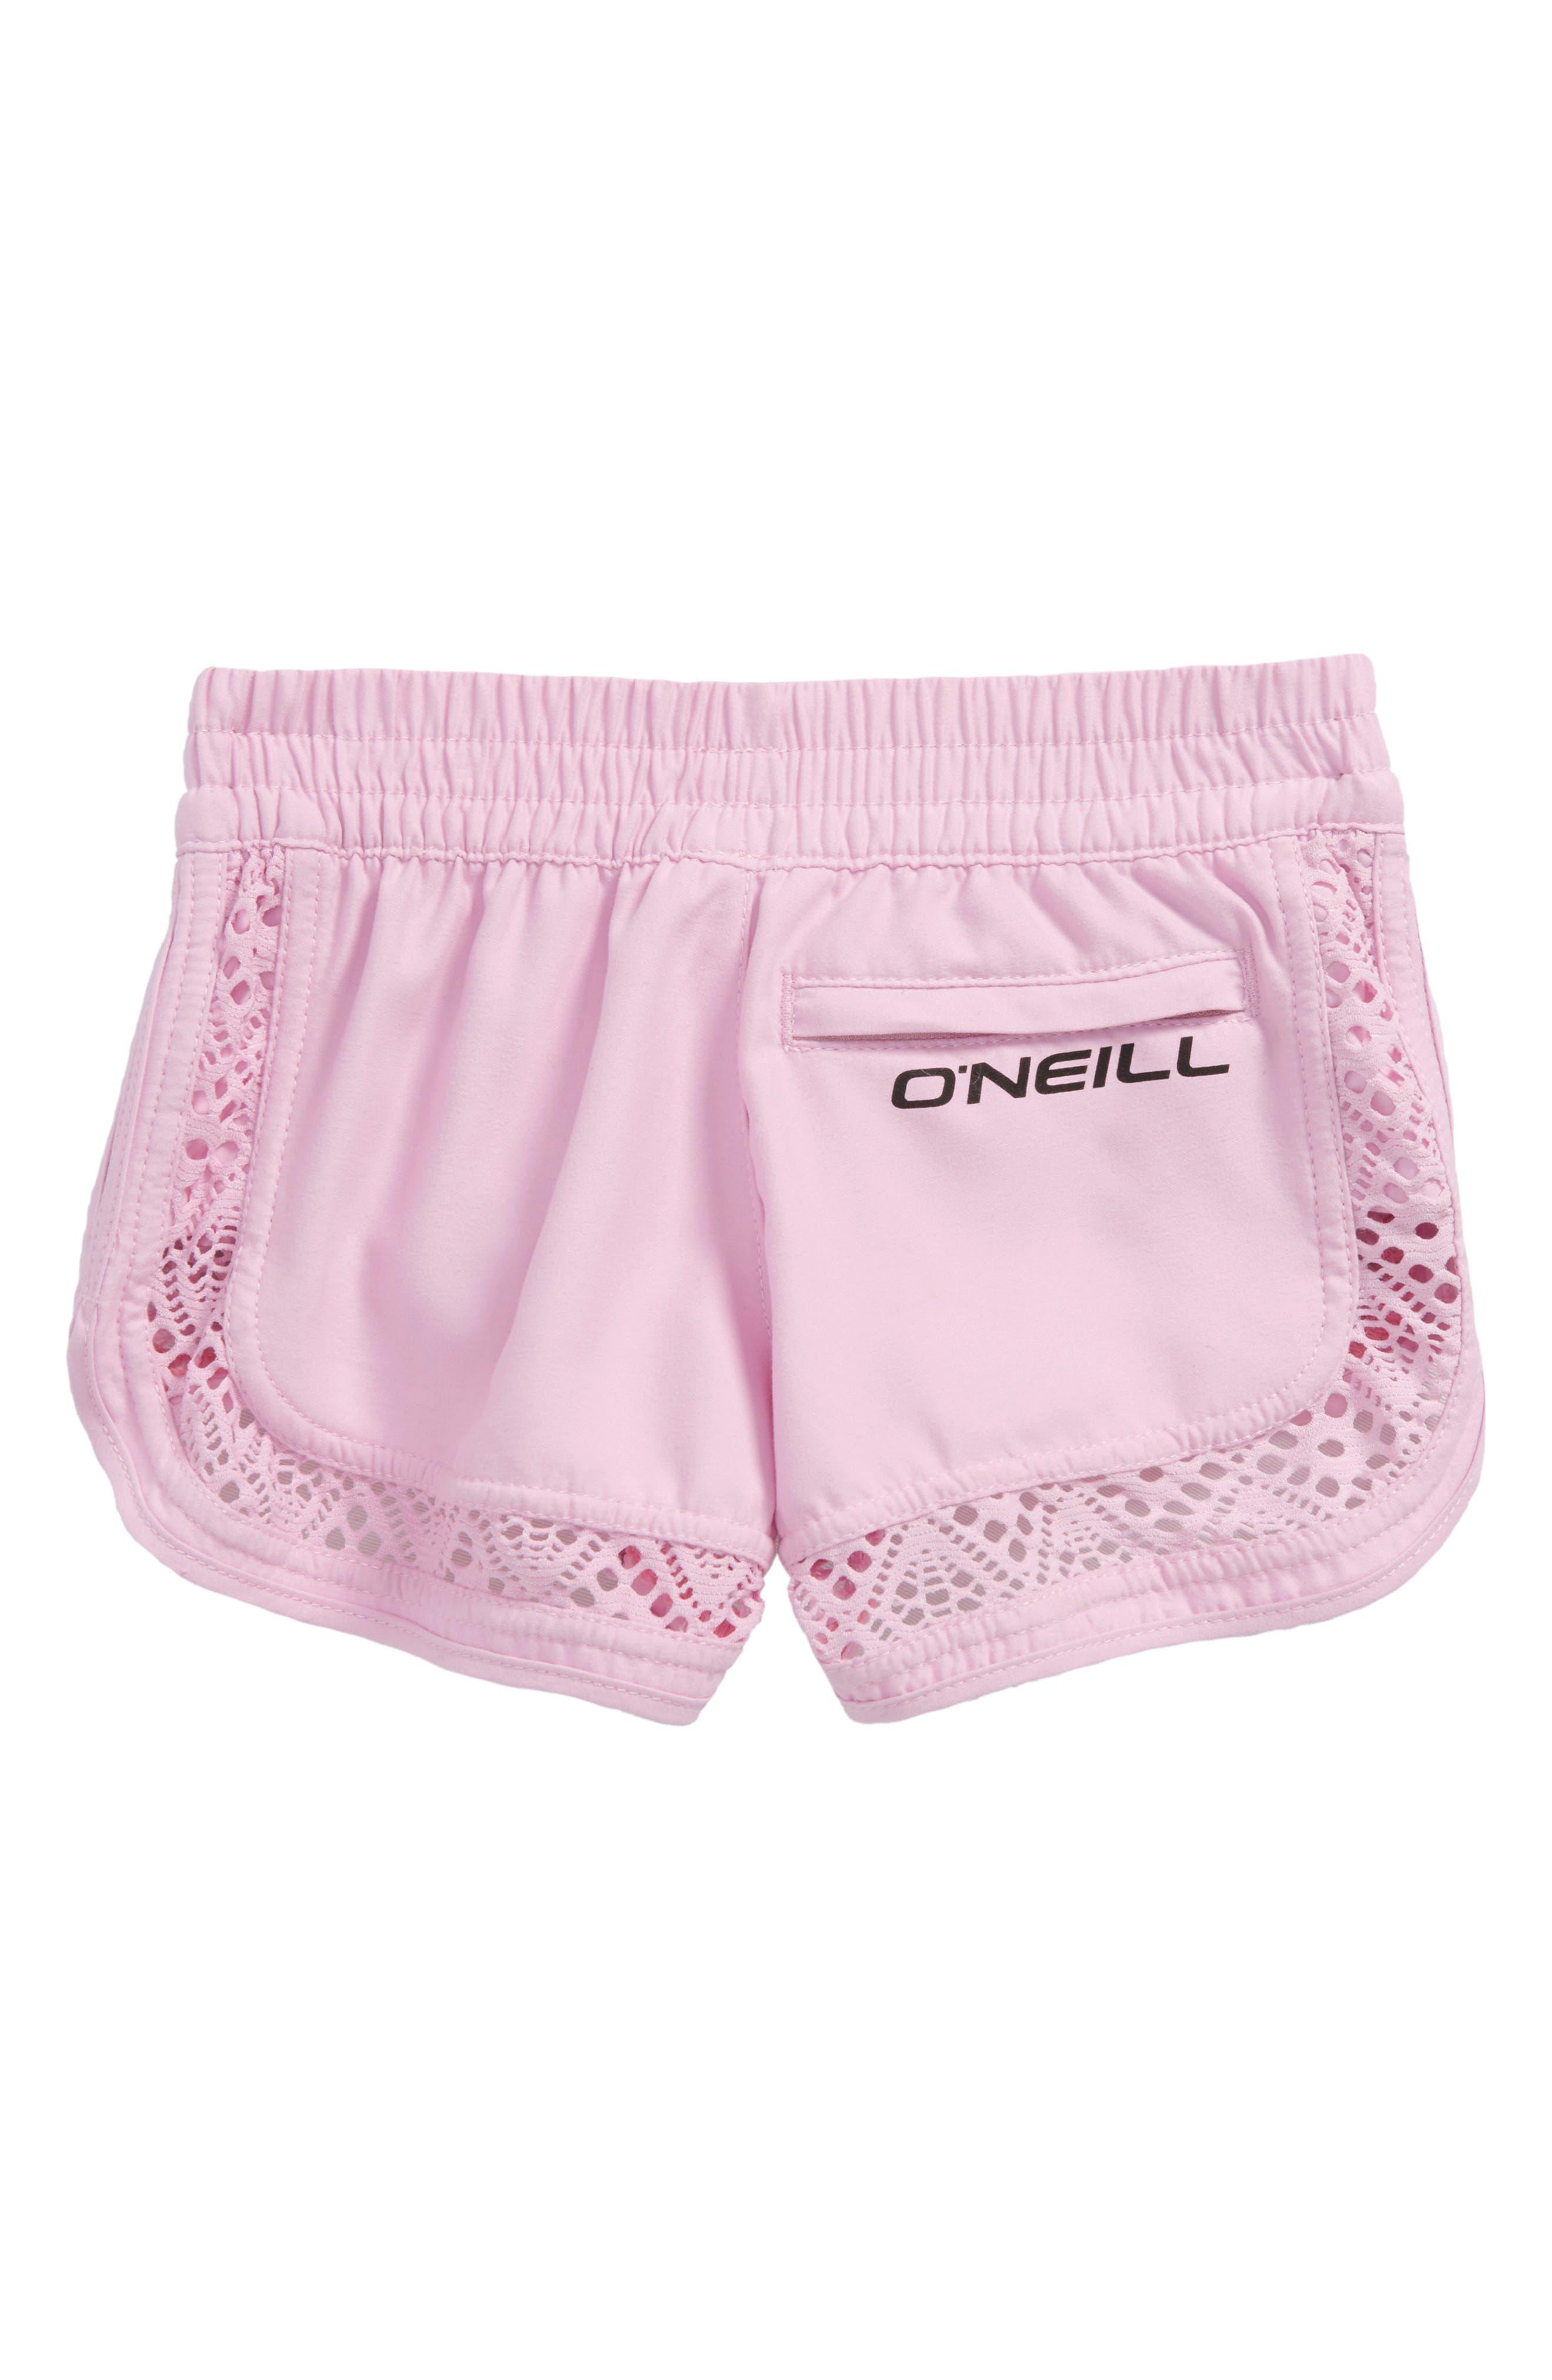 Renewal 2 Board Shorts,                             Alternate thumbnail 2, color,                             Pink Lavender